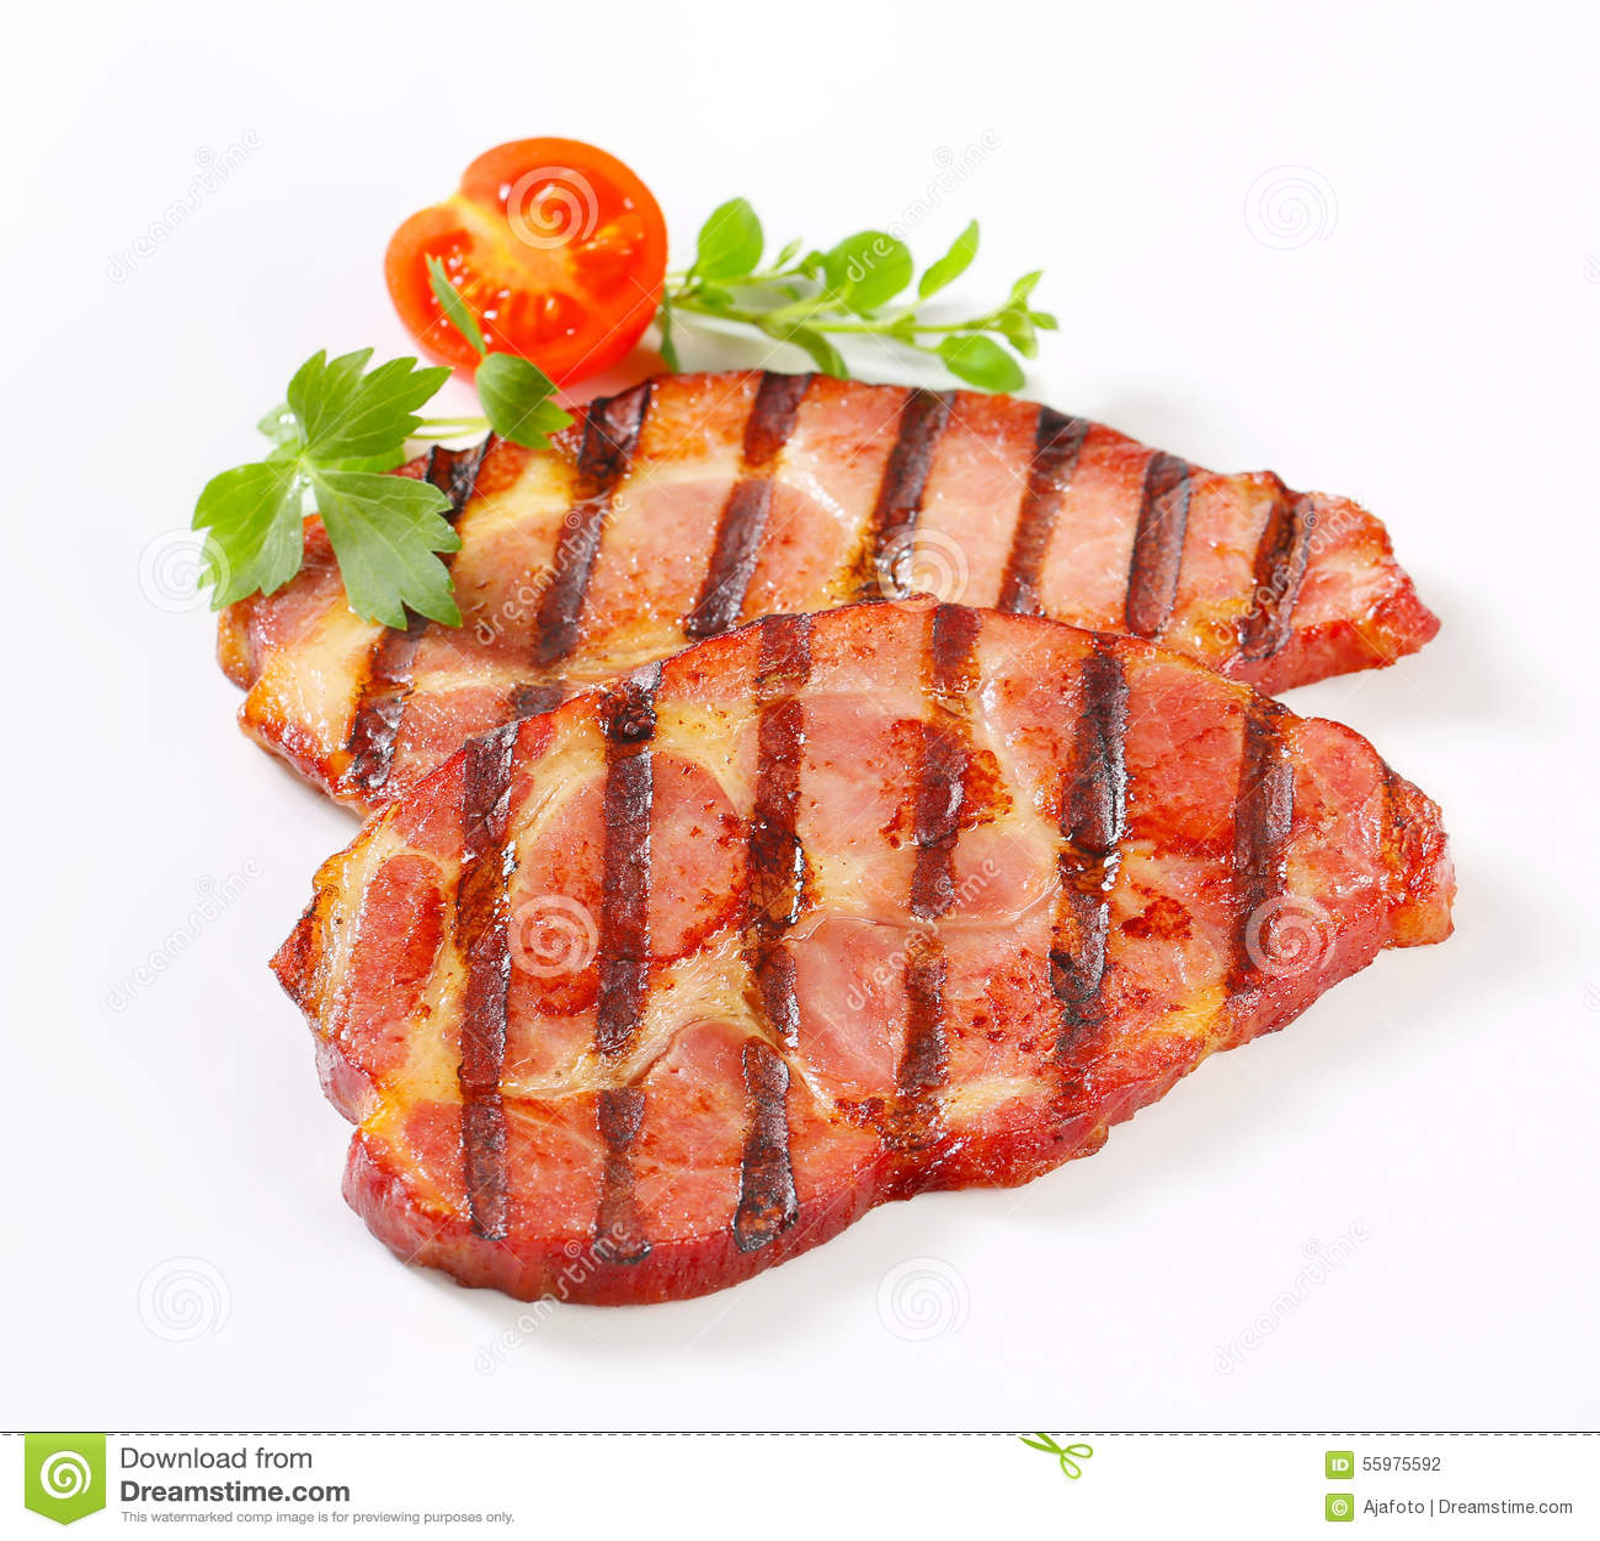 Grilled Pork Neck Steaks Stock Photo - Image: 55975592